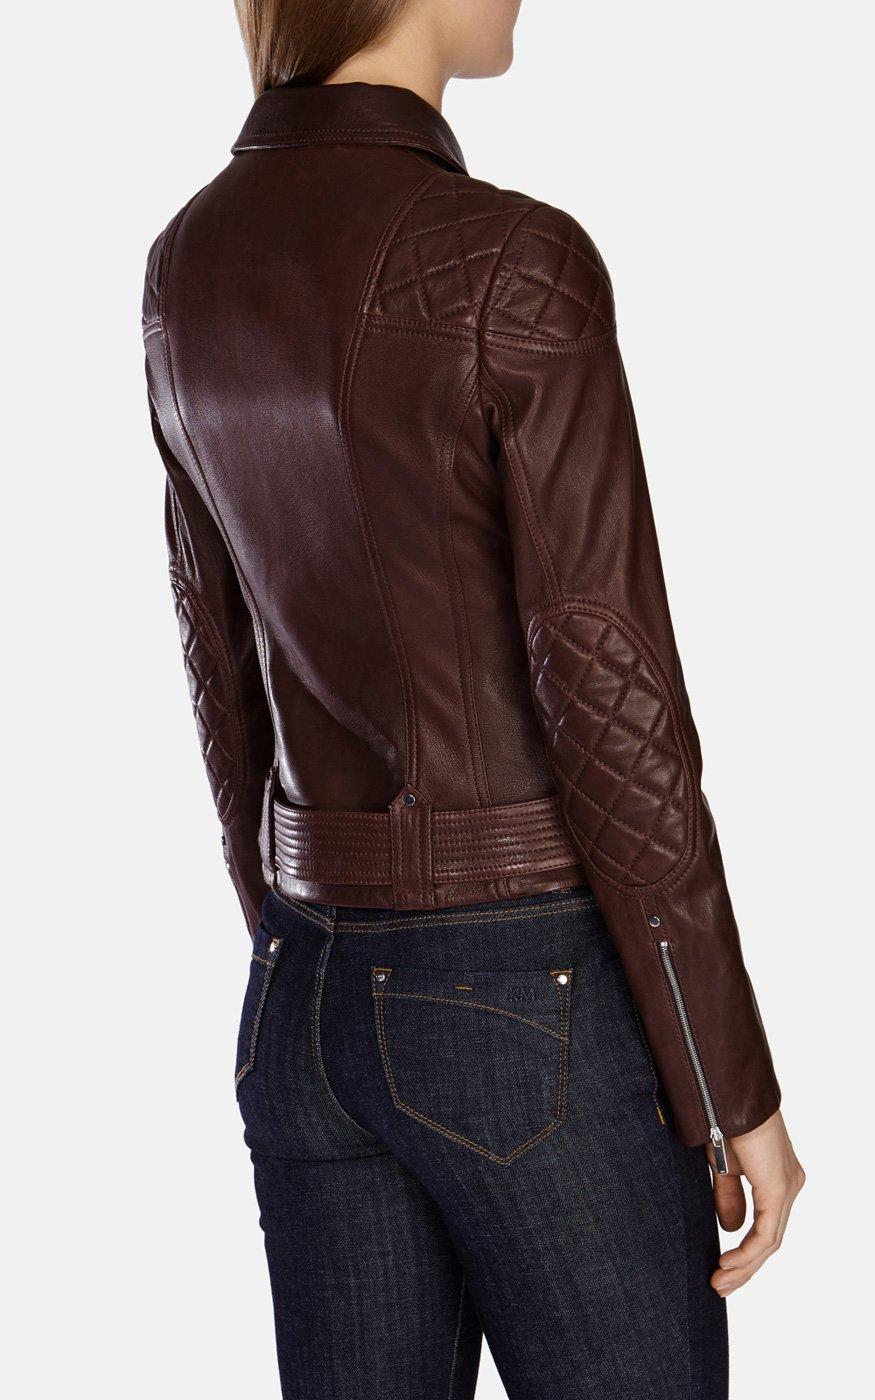 Karen o leather jacket